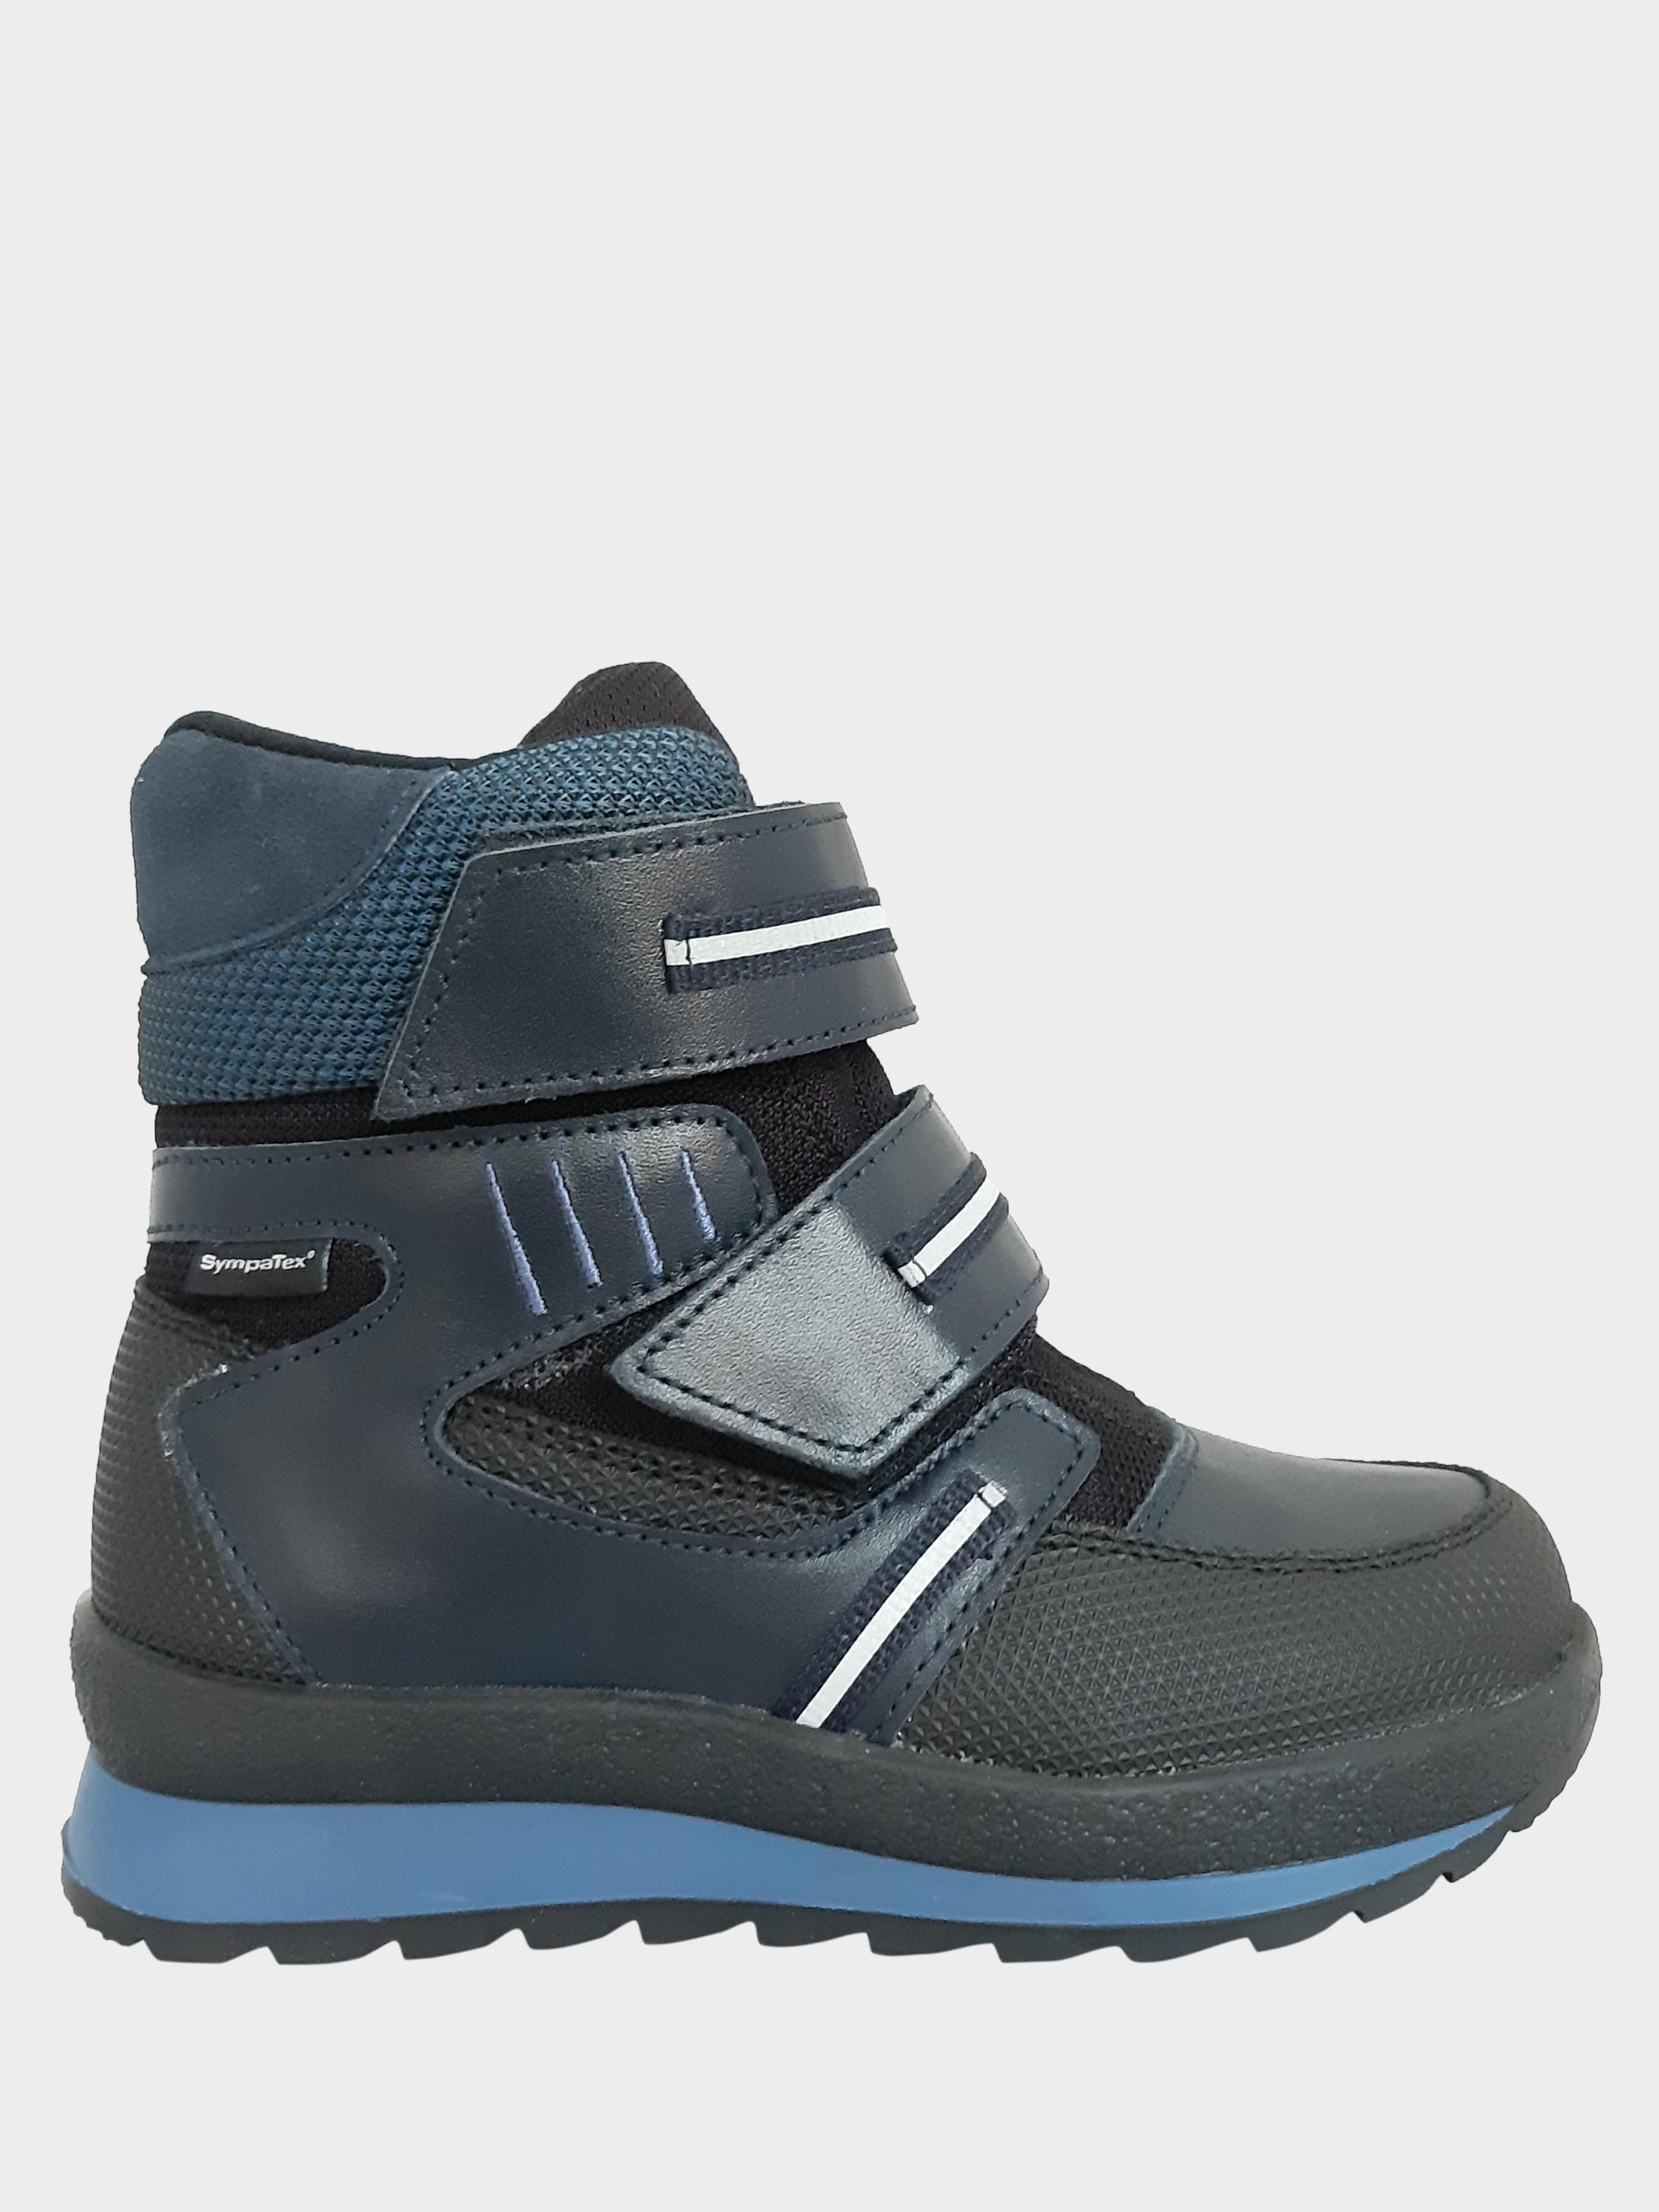 Купить Ботинки детские Ботинки Minimen 11SINIY19 11SINIY19, Синий